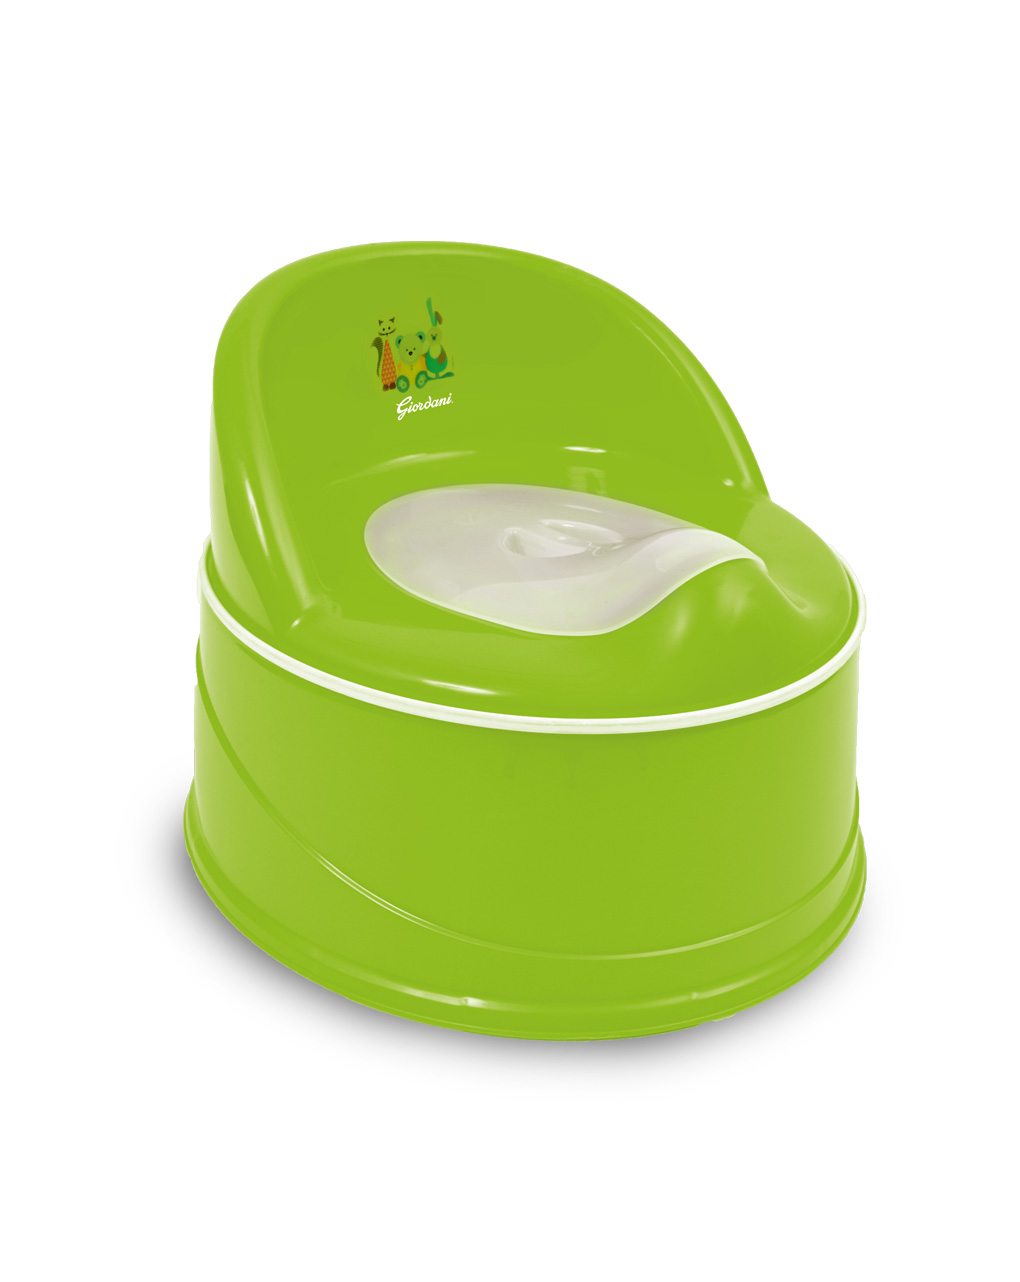 Vasino riduttore + riduttore wc + pedana rialzo verde - Giordani